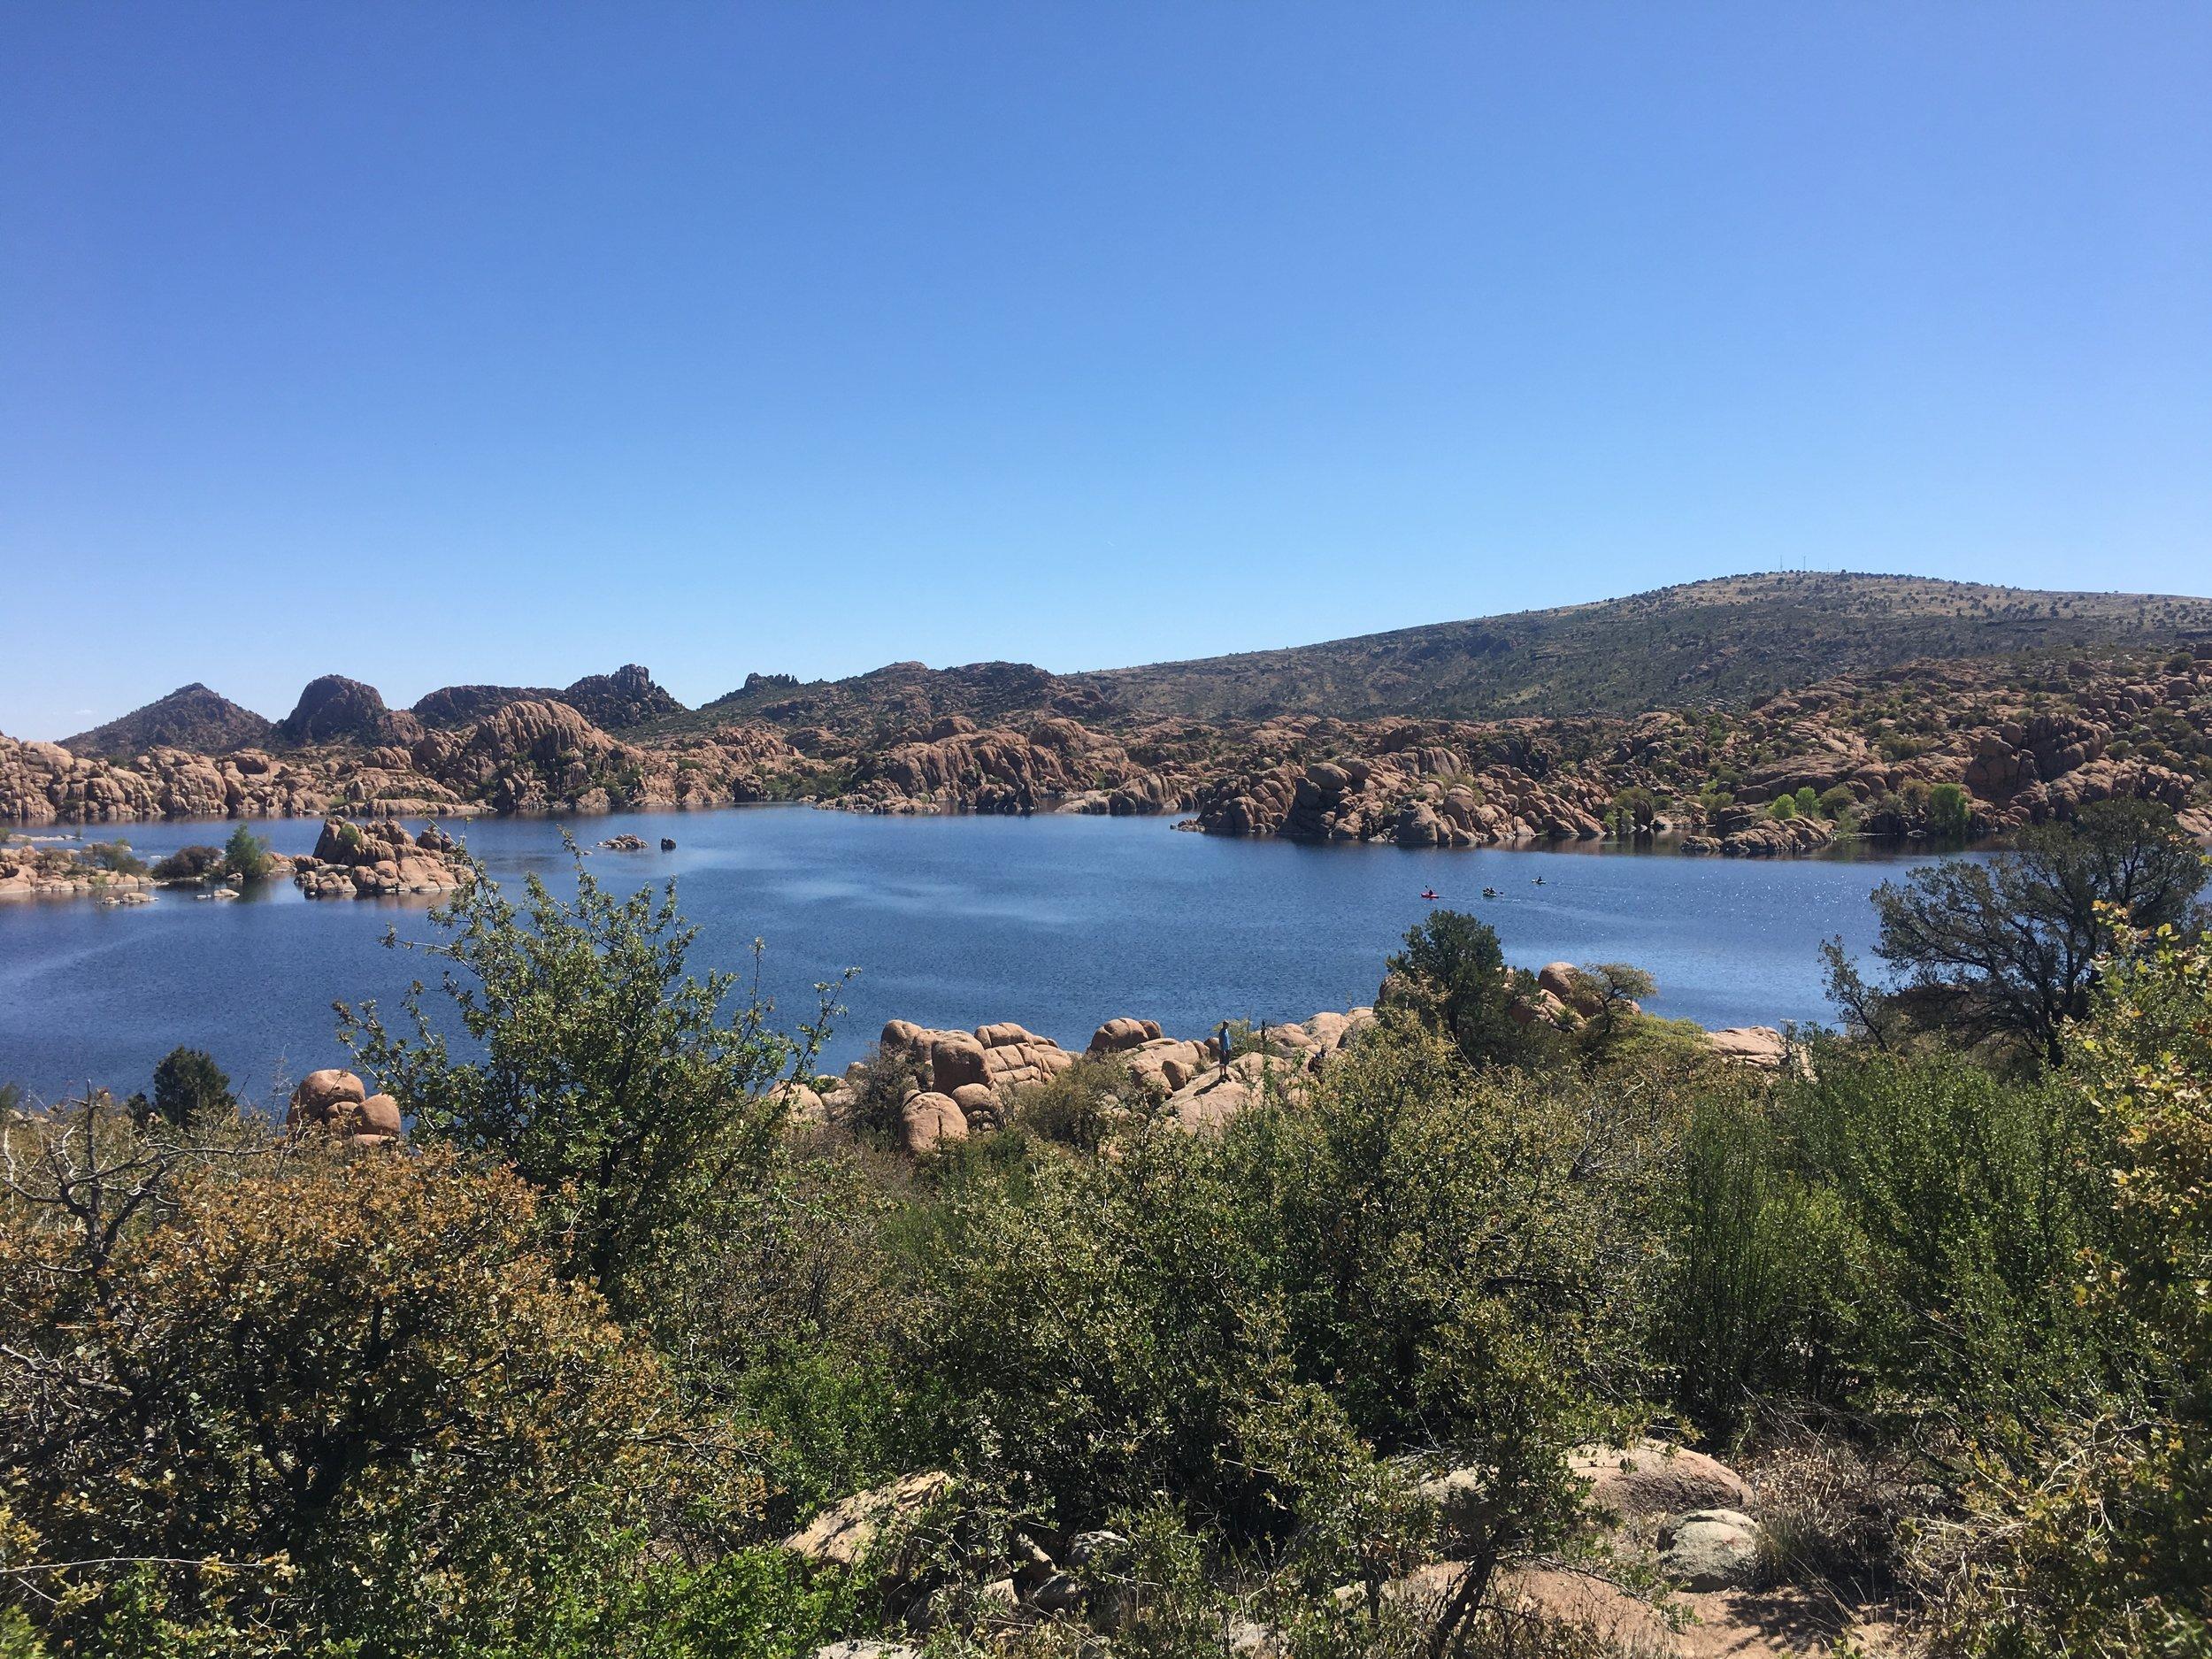 Watson Lake in Prescott, Arizona